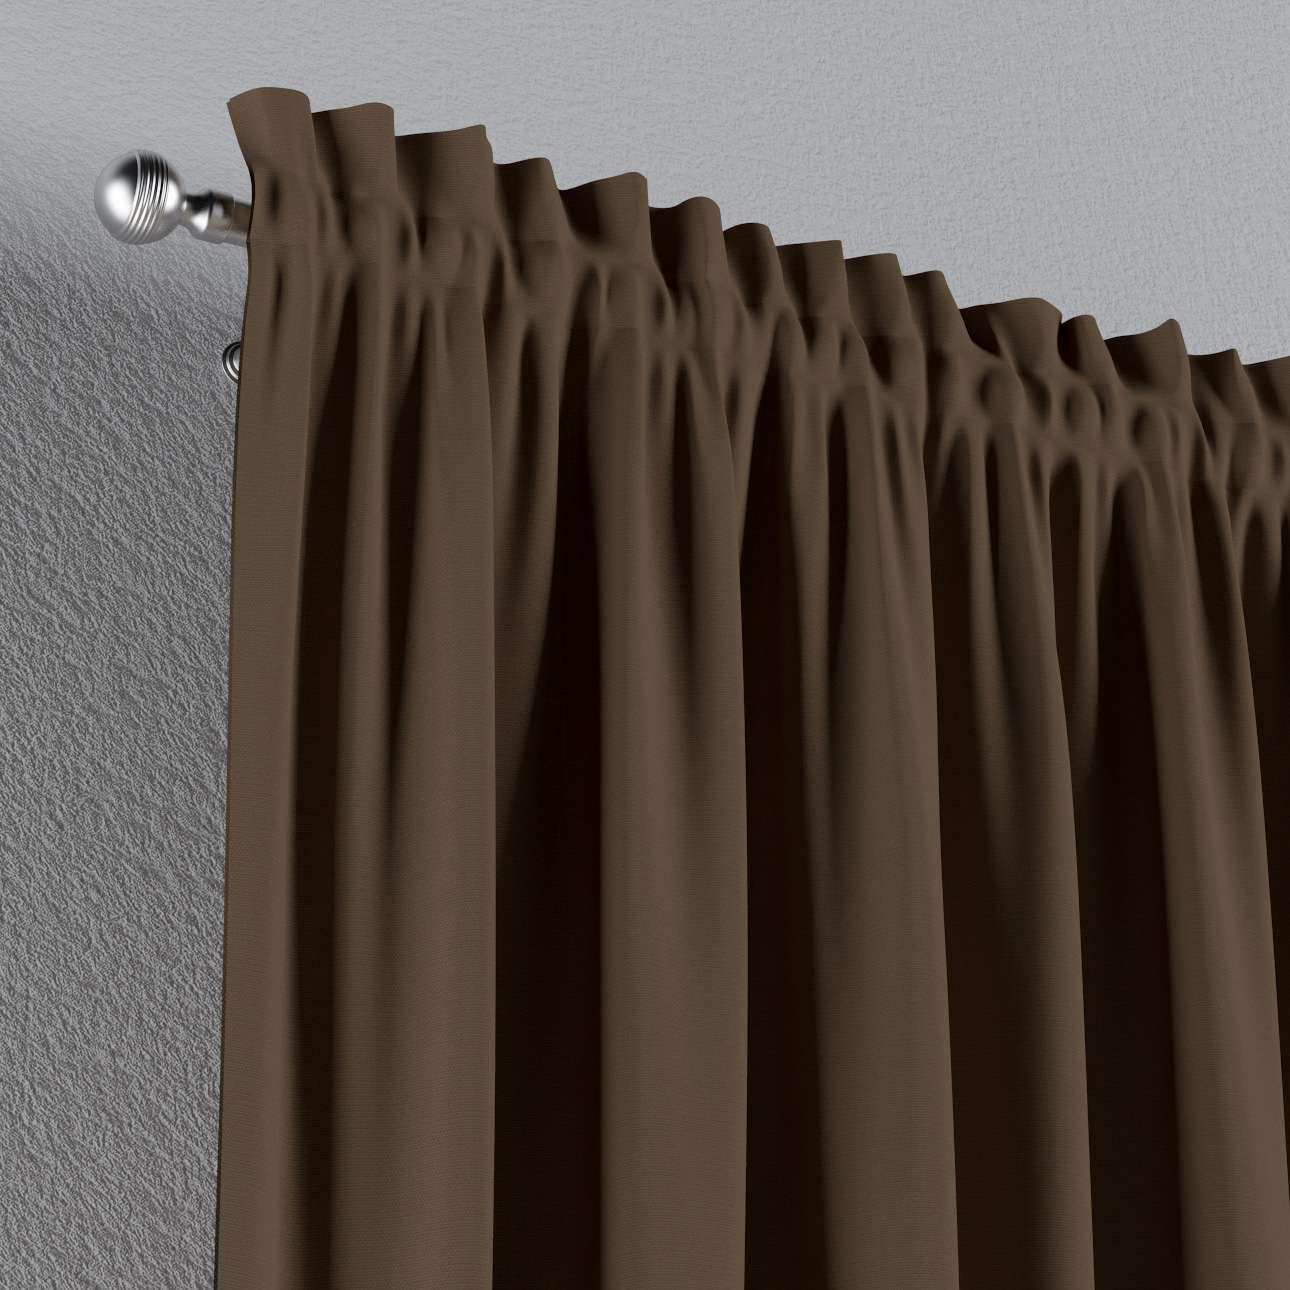 Gardin med løbegang - multibånd 130 × 260 cm fra kollektionen Cotton Panama, Stof: 702-02